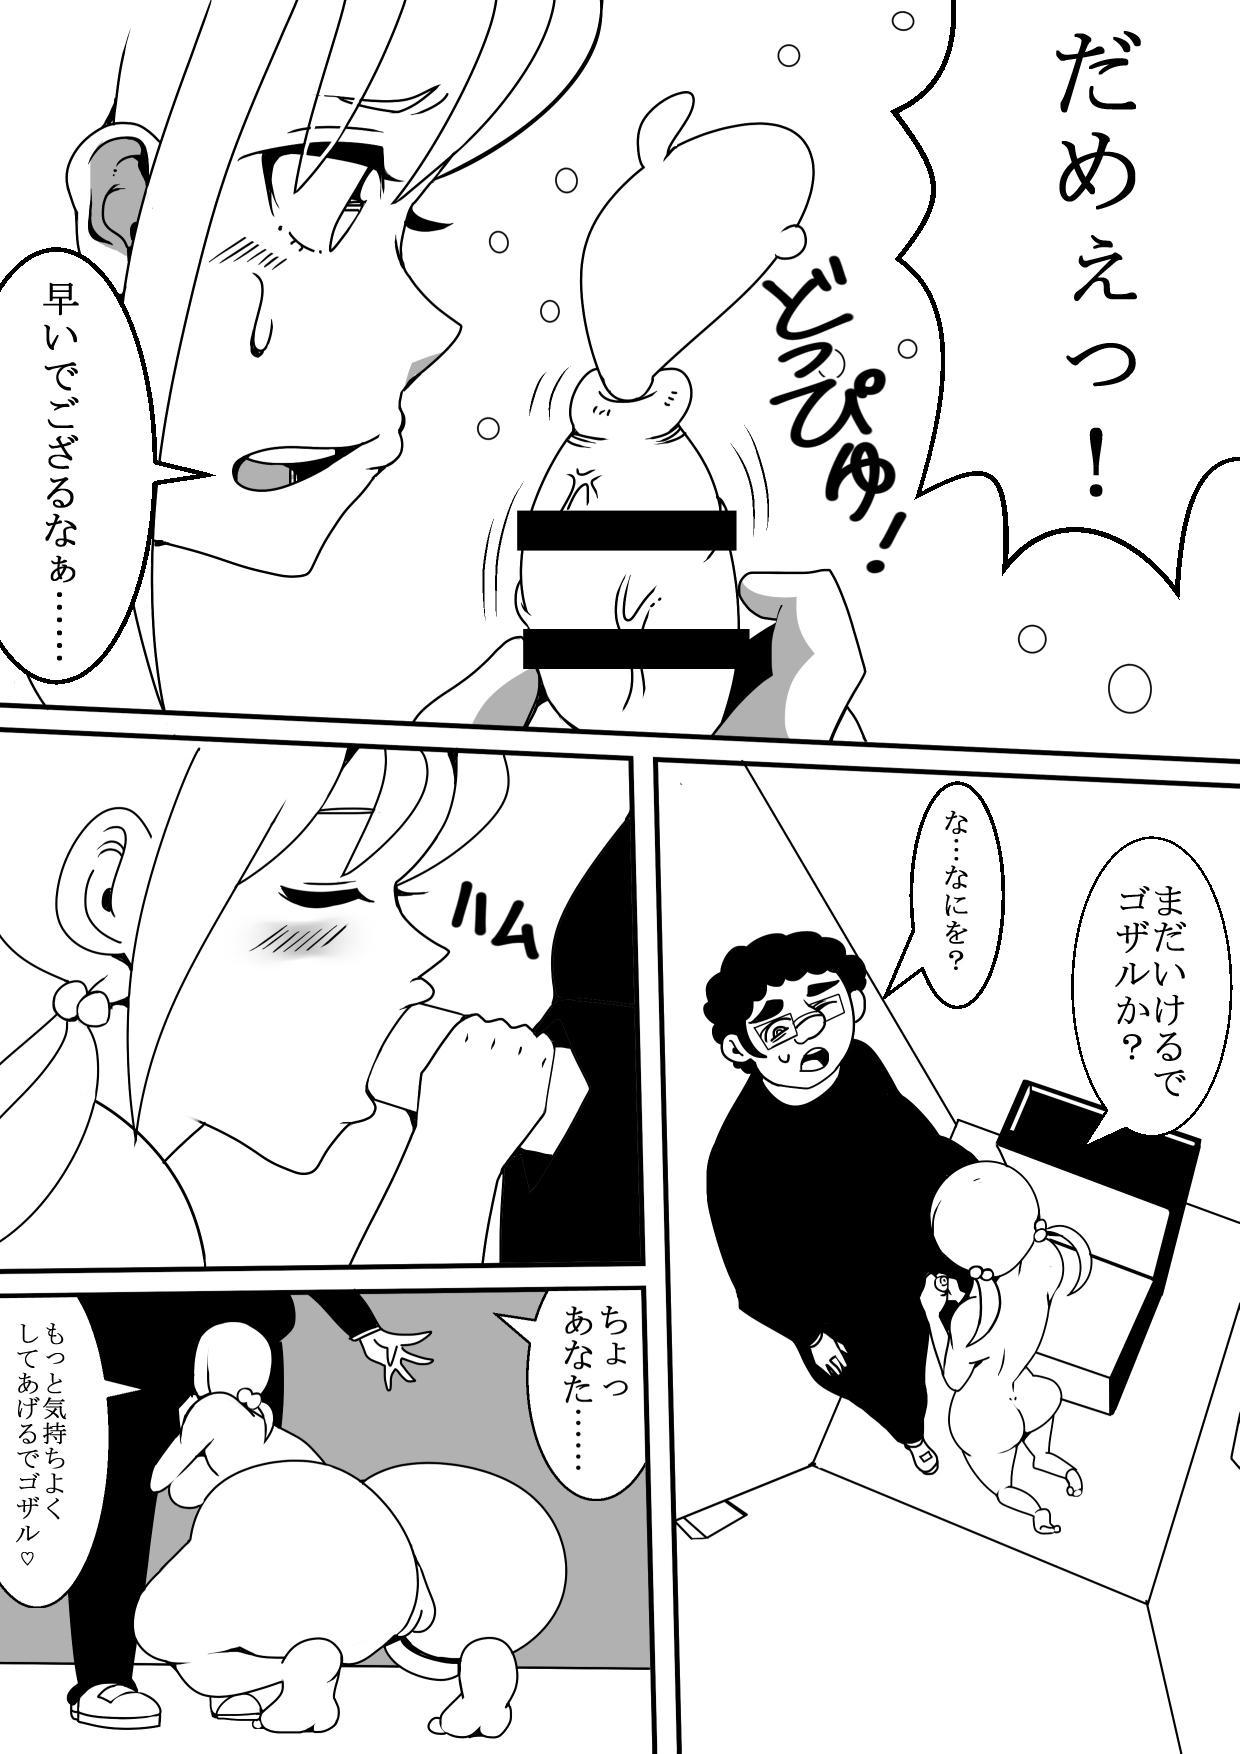 Kawaii JK to Kimoota ga Irekawari Sex 14